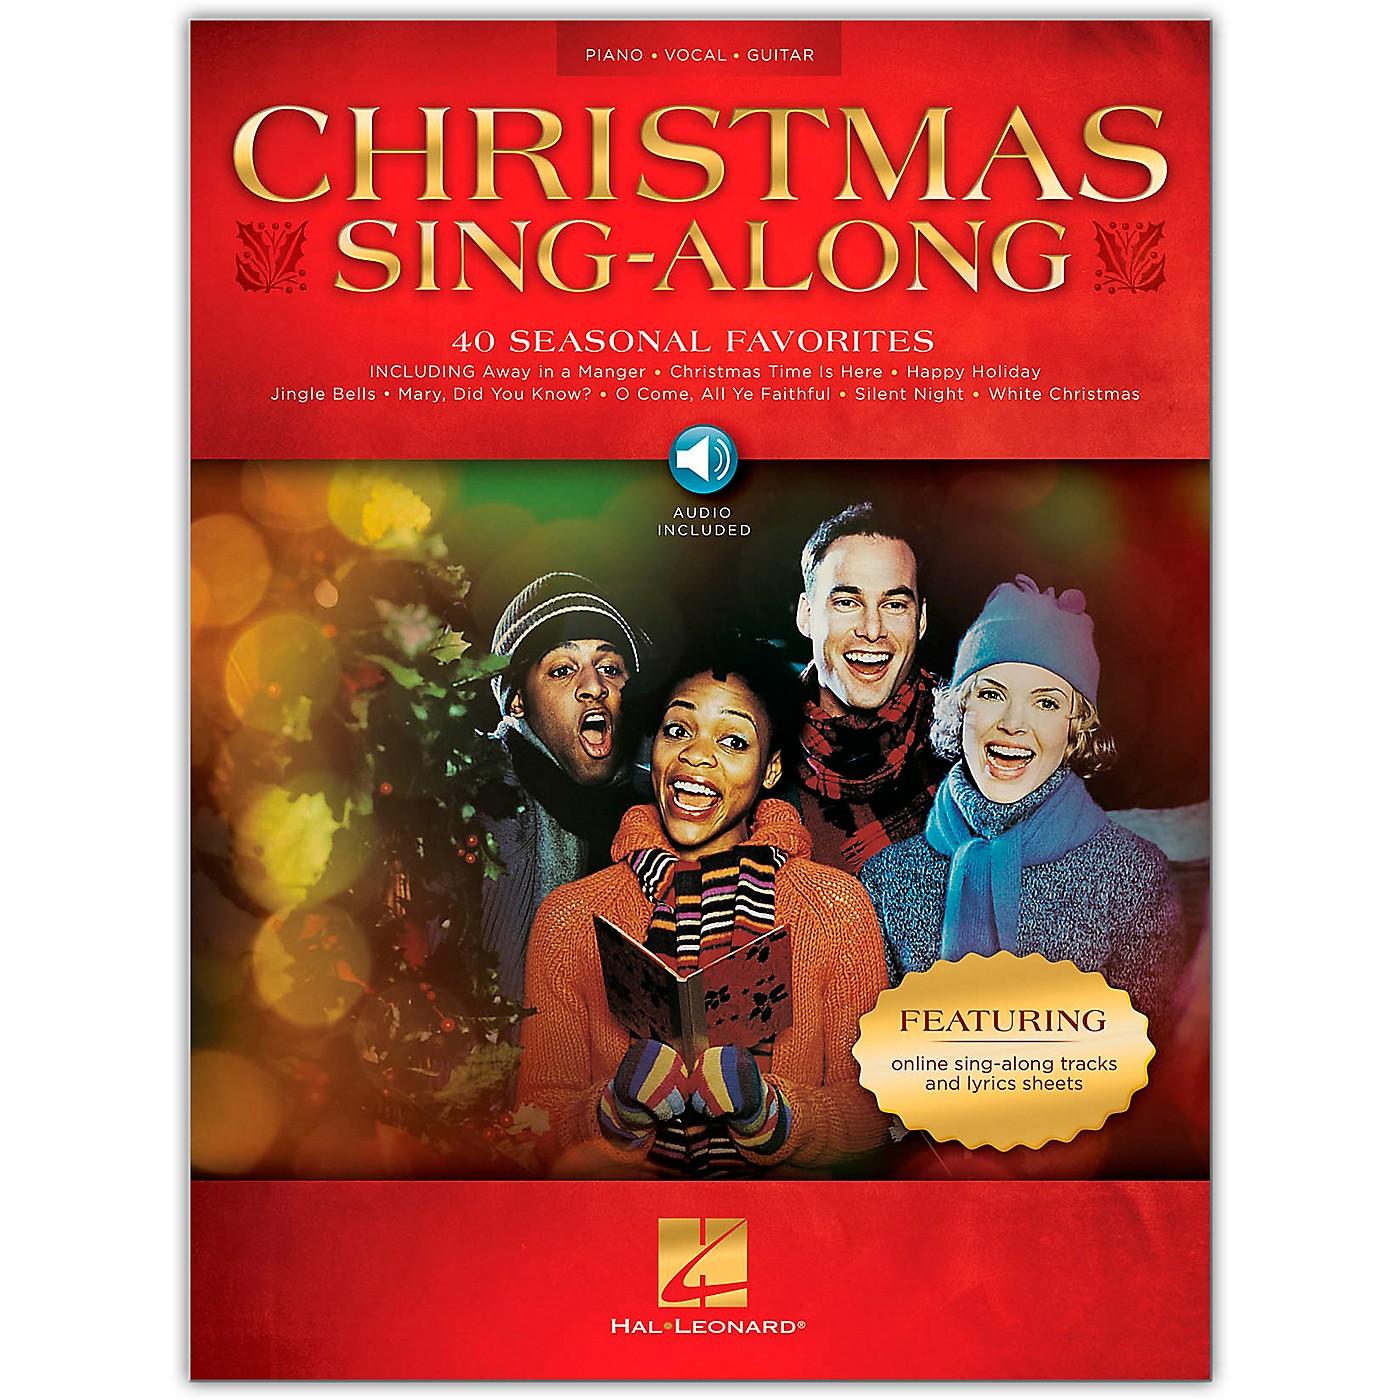 Hal Leonard Christmas Sing-Along Piano/Vocal/Guitar Book/Audio Online thumbnail